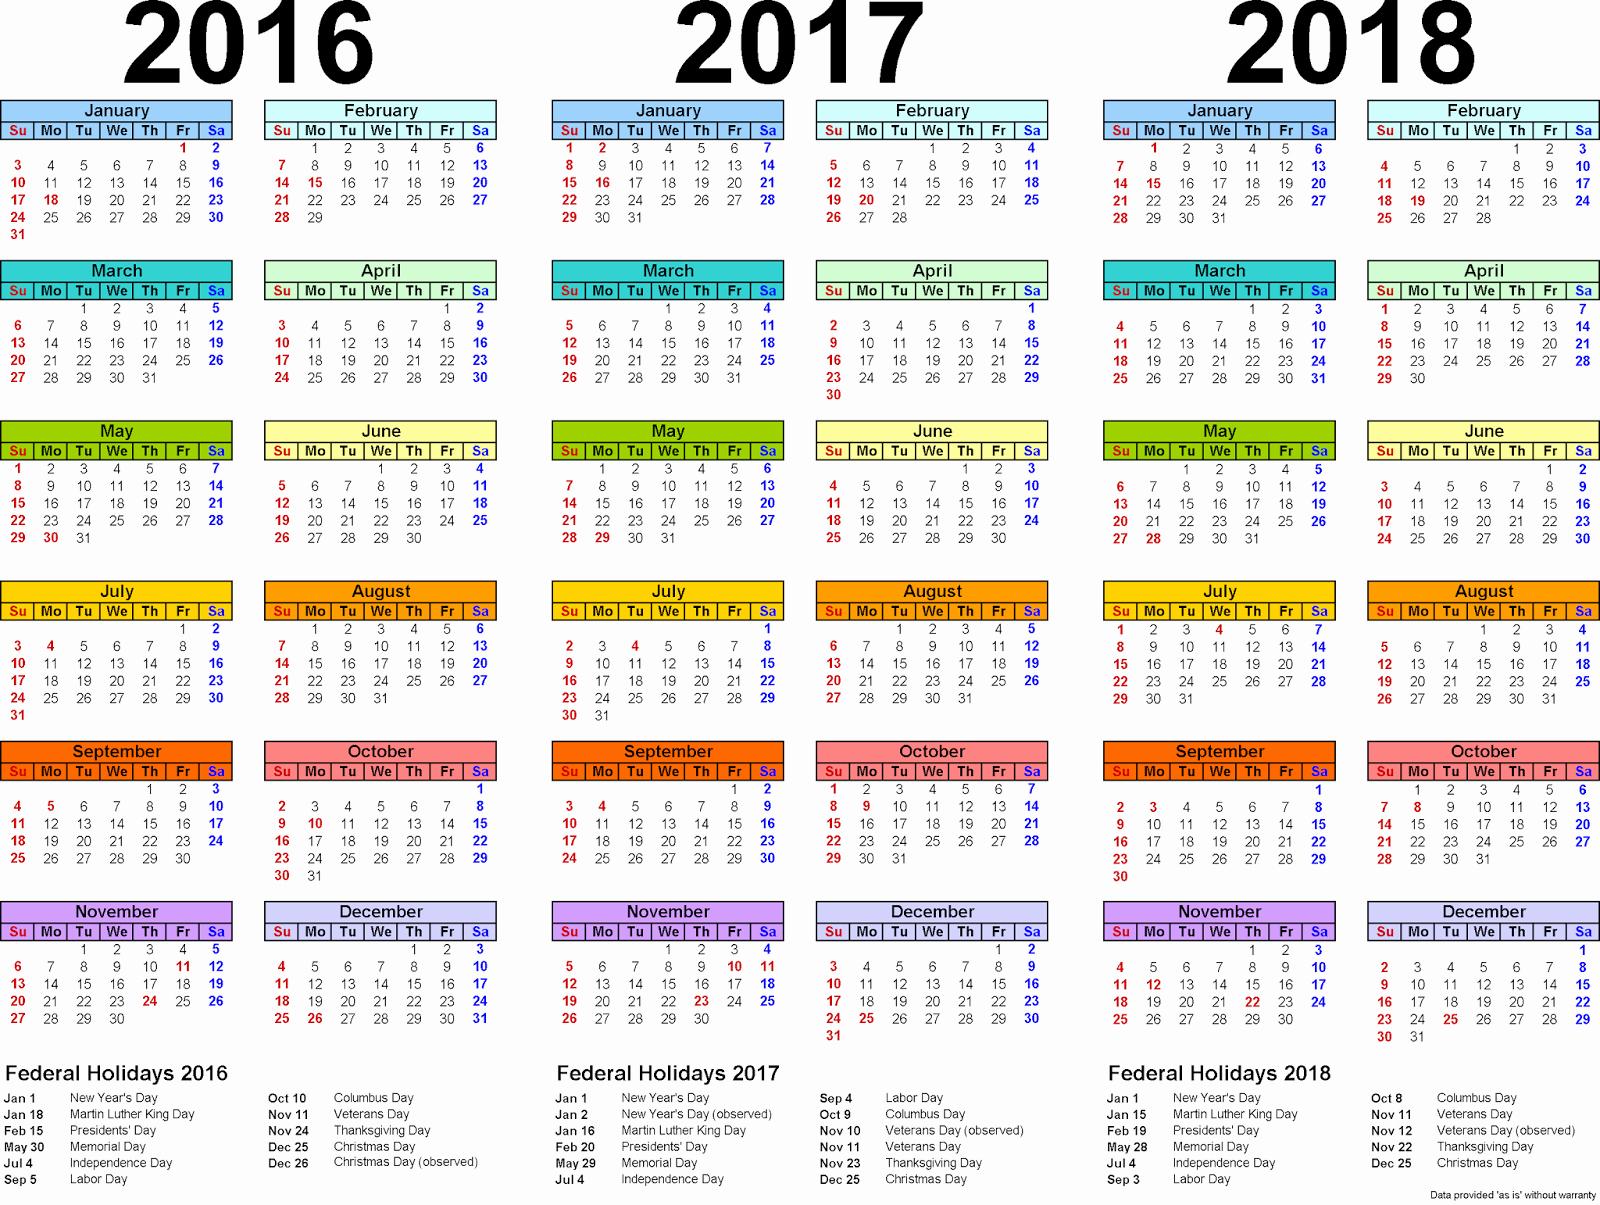 Blank Calendar 2016-17 Inspirational 2016 2017 2018 Calendar 3 Year Printable